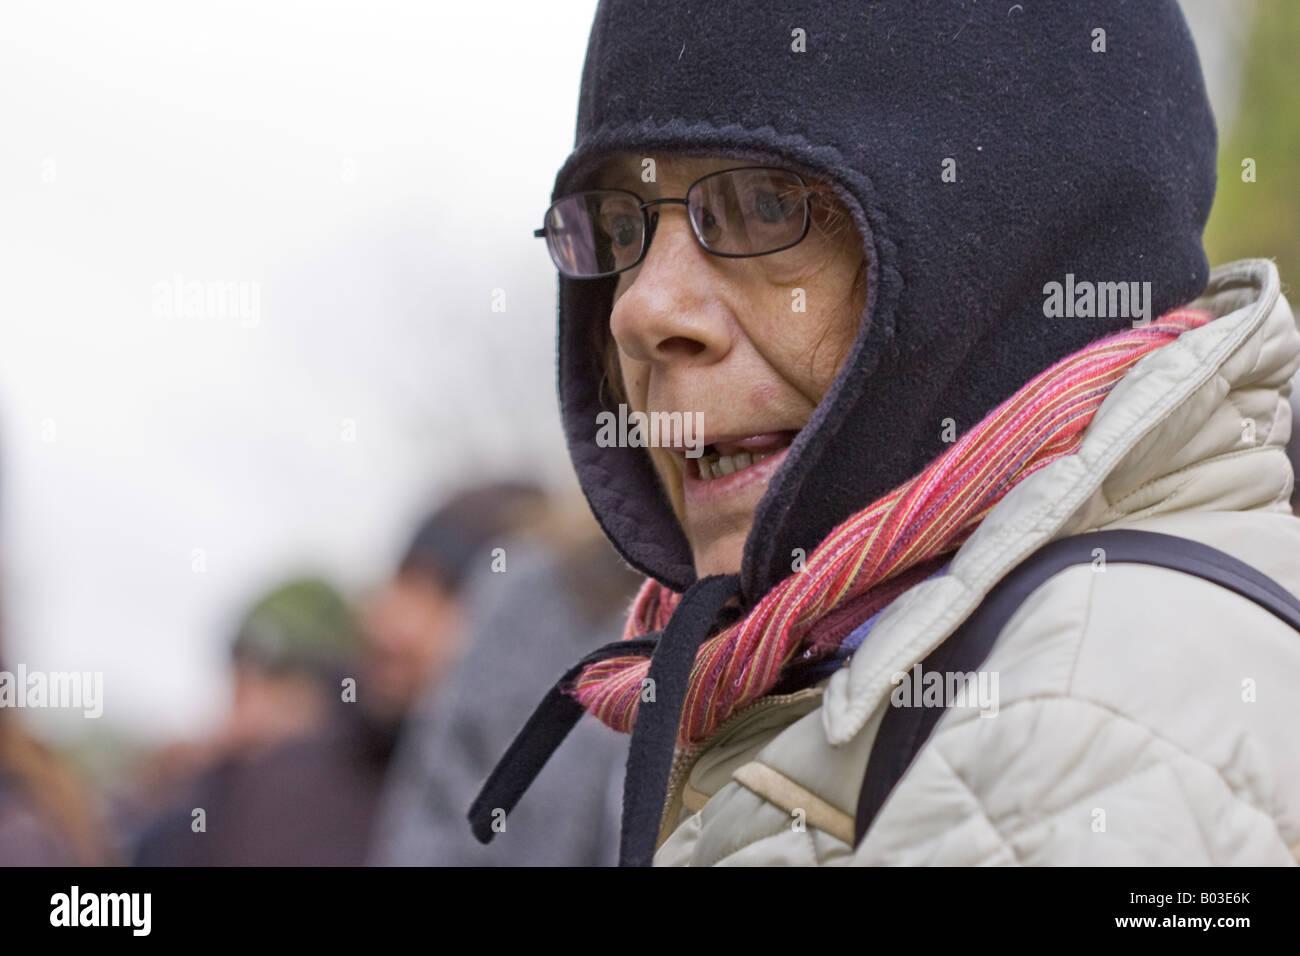 Woman Close-up, London - Stock Image